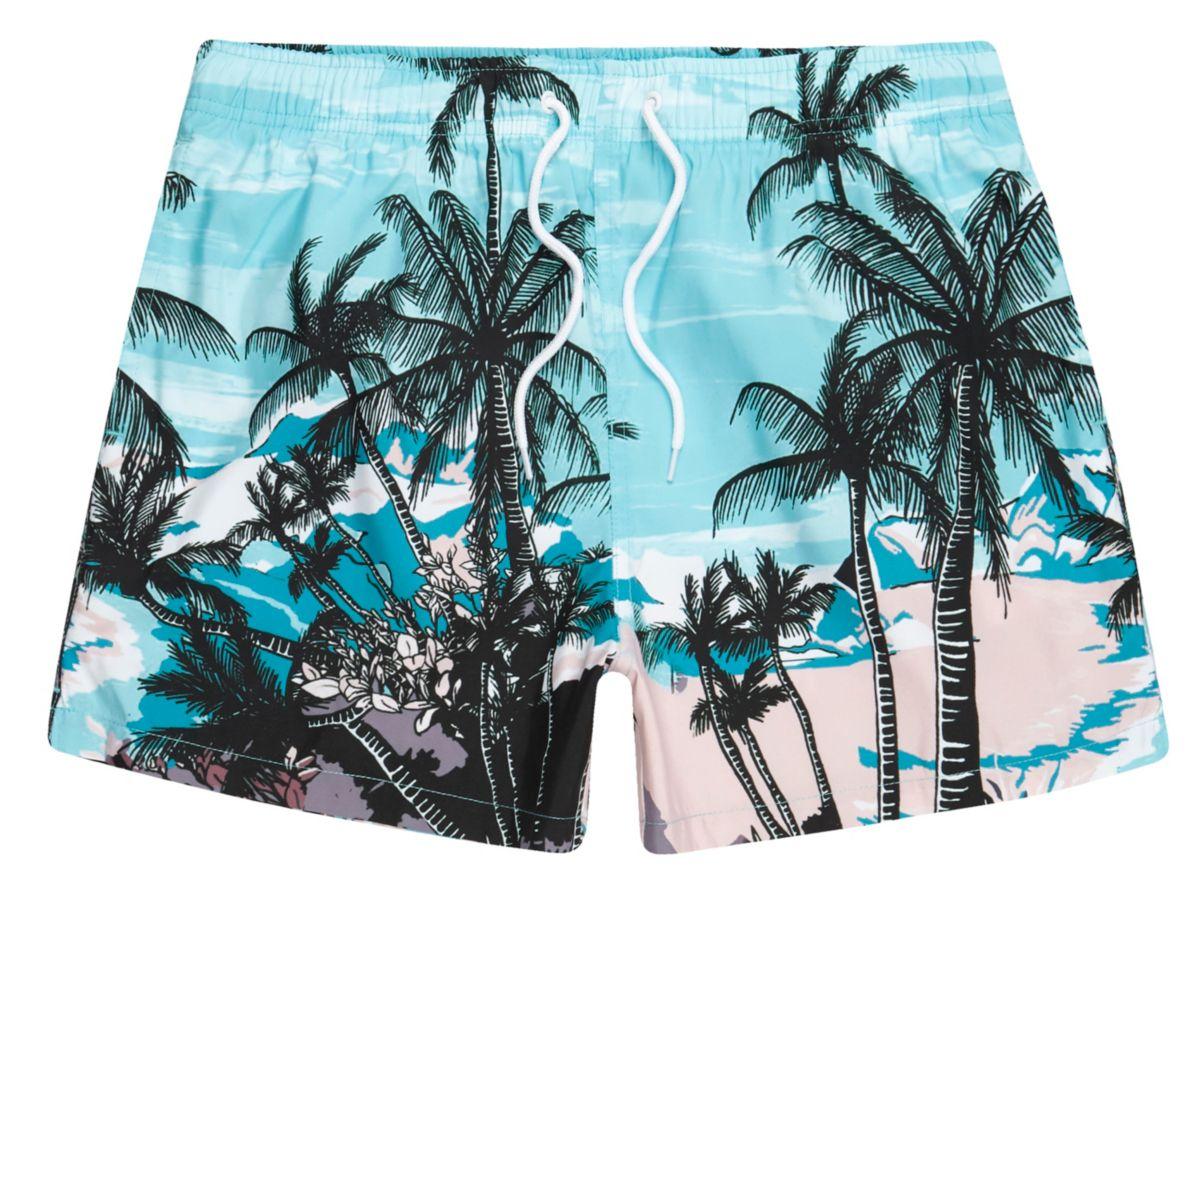 Blue palm tree beach scene print swim trunks